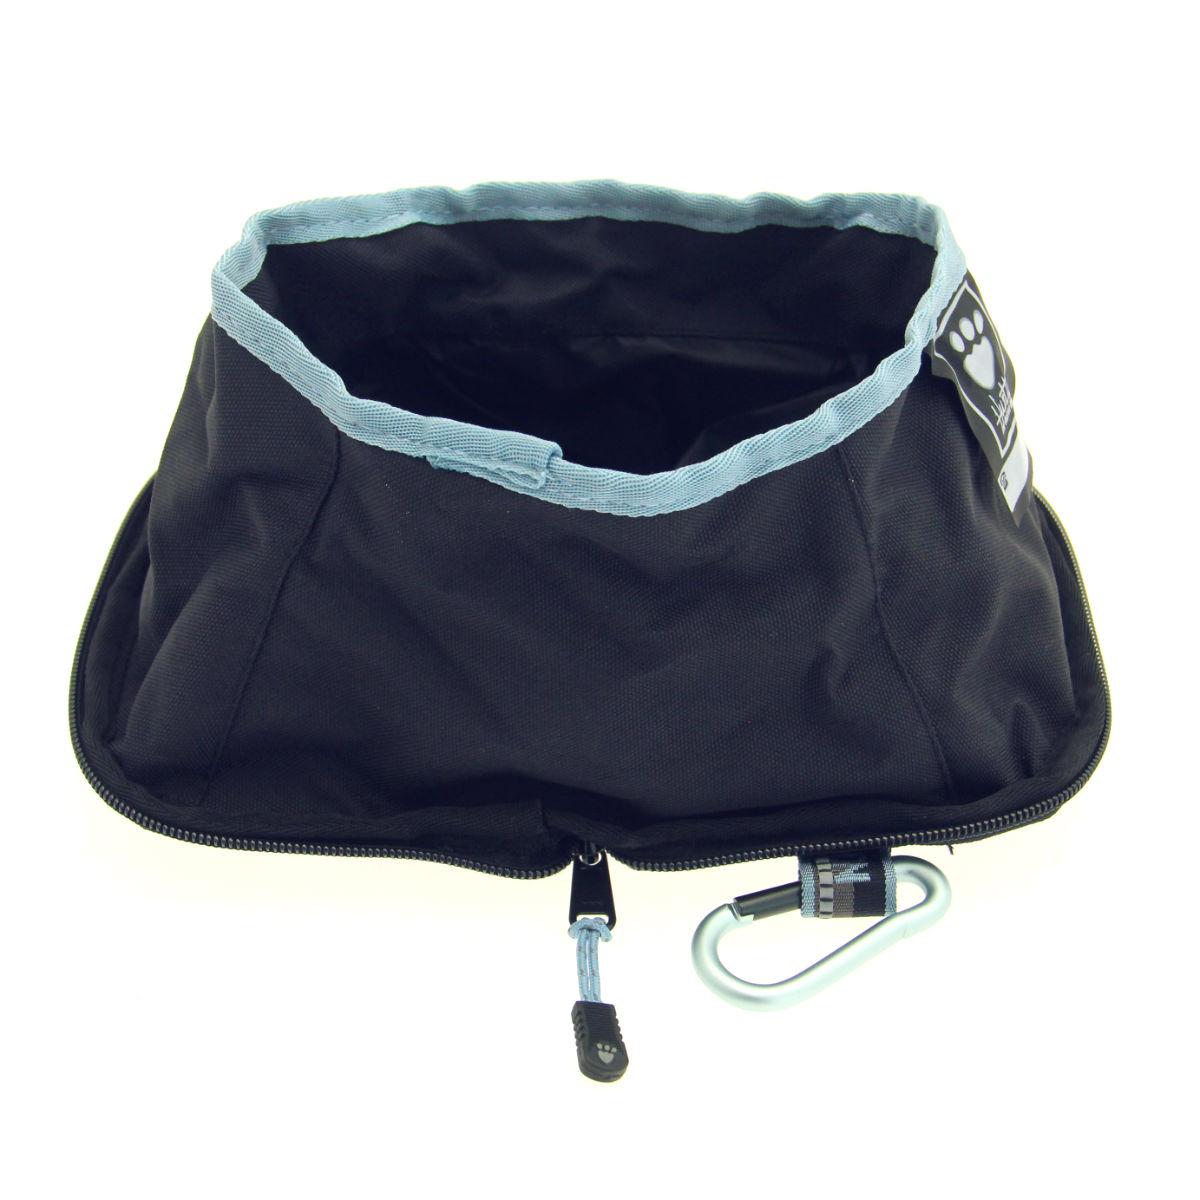 hurtta-folded-travel-bowl-blue-trim-2